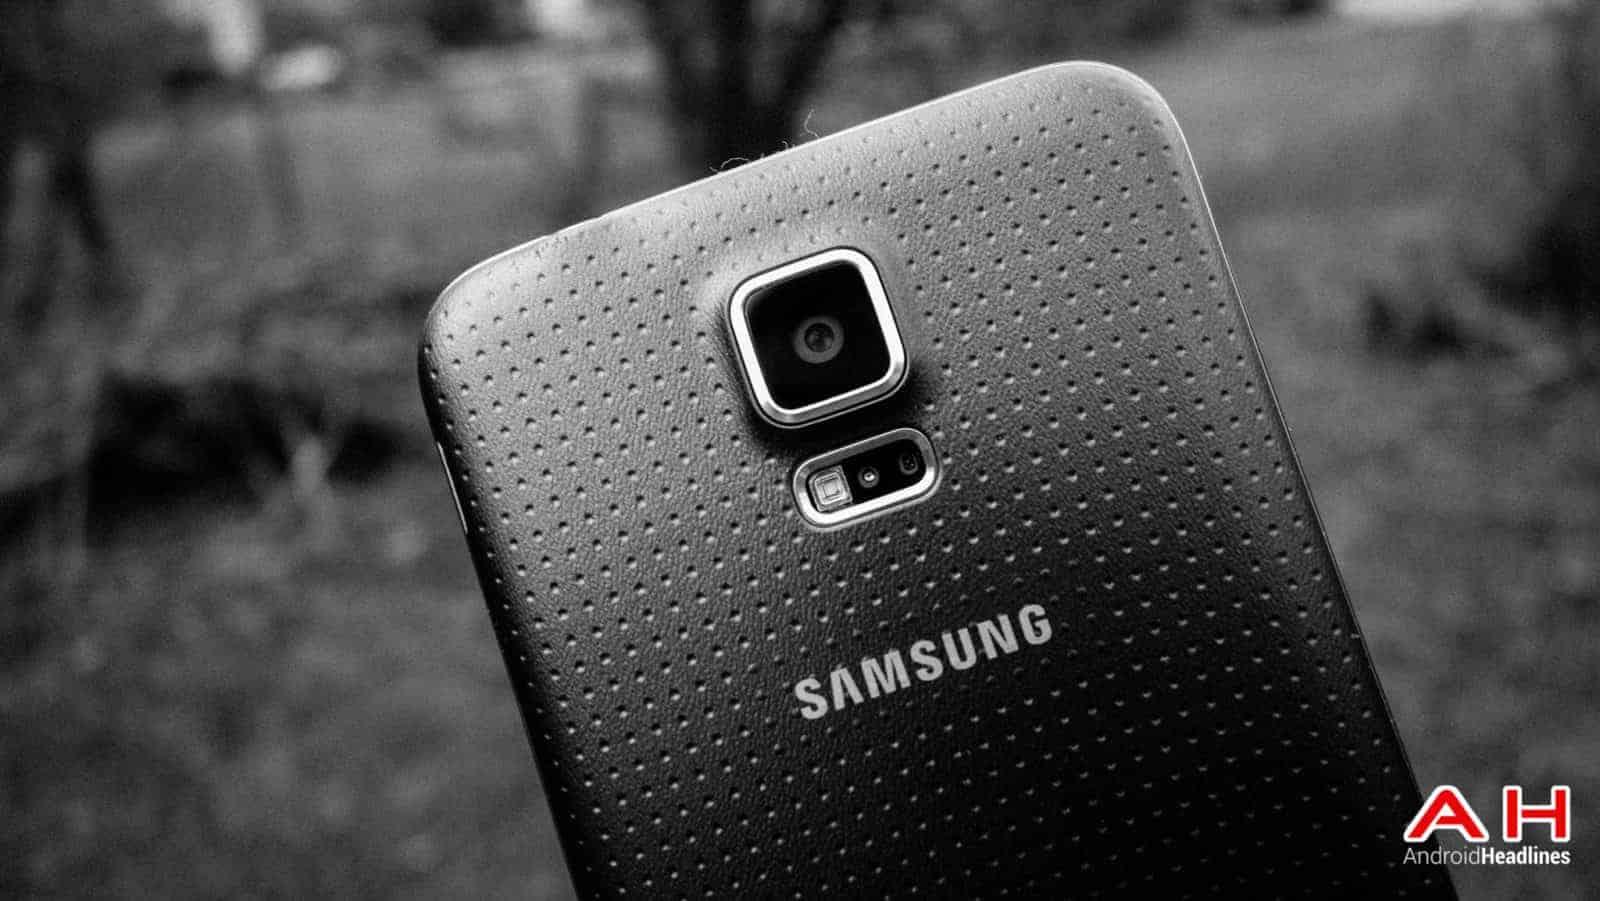 Samsung-galaxy-s5-ah-1-2